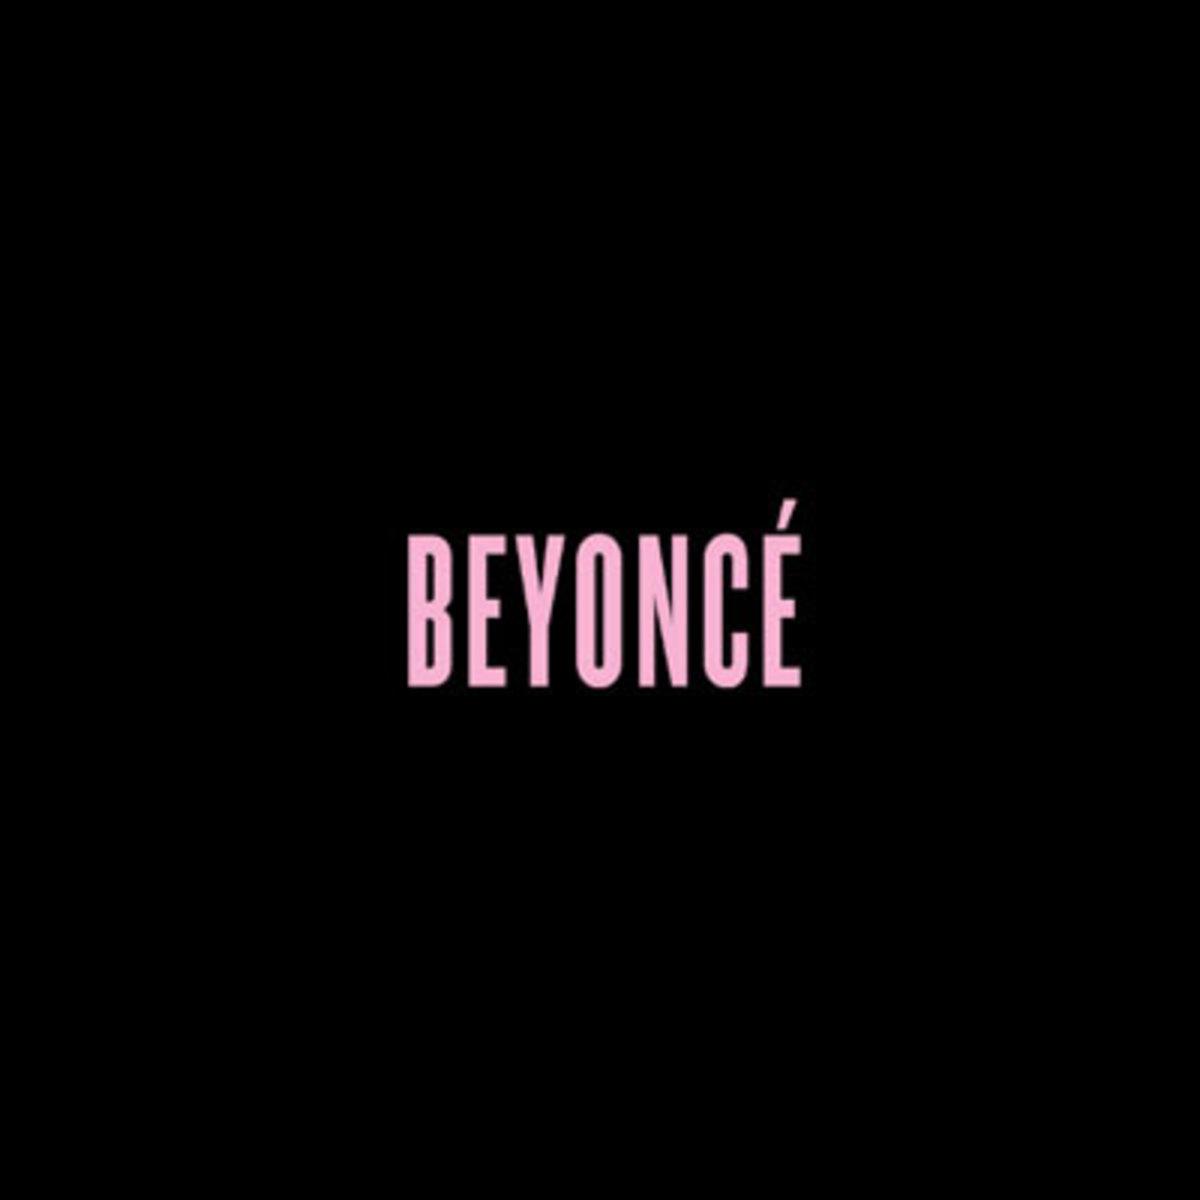 beyonce feat busta rhymes azealia banks partition yoshim remix instrumental